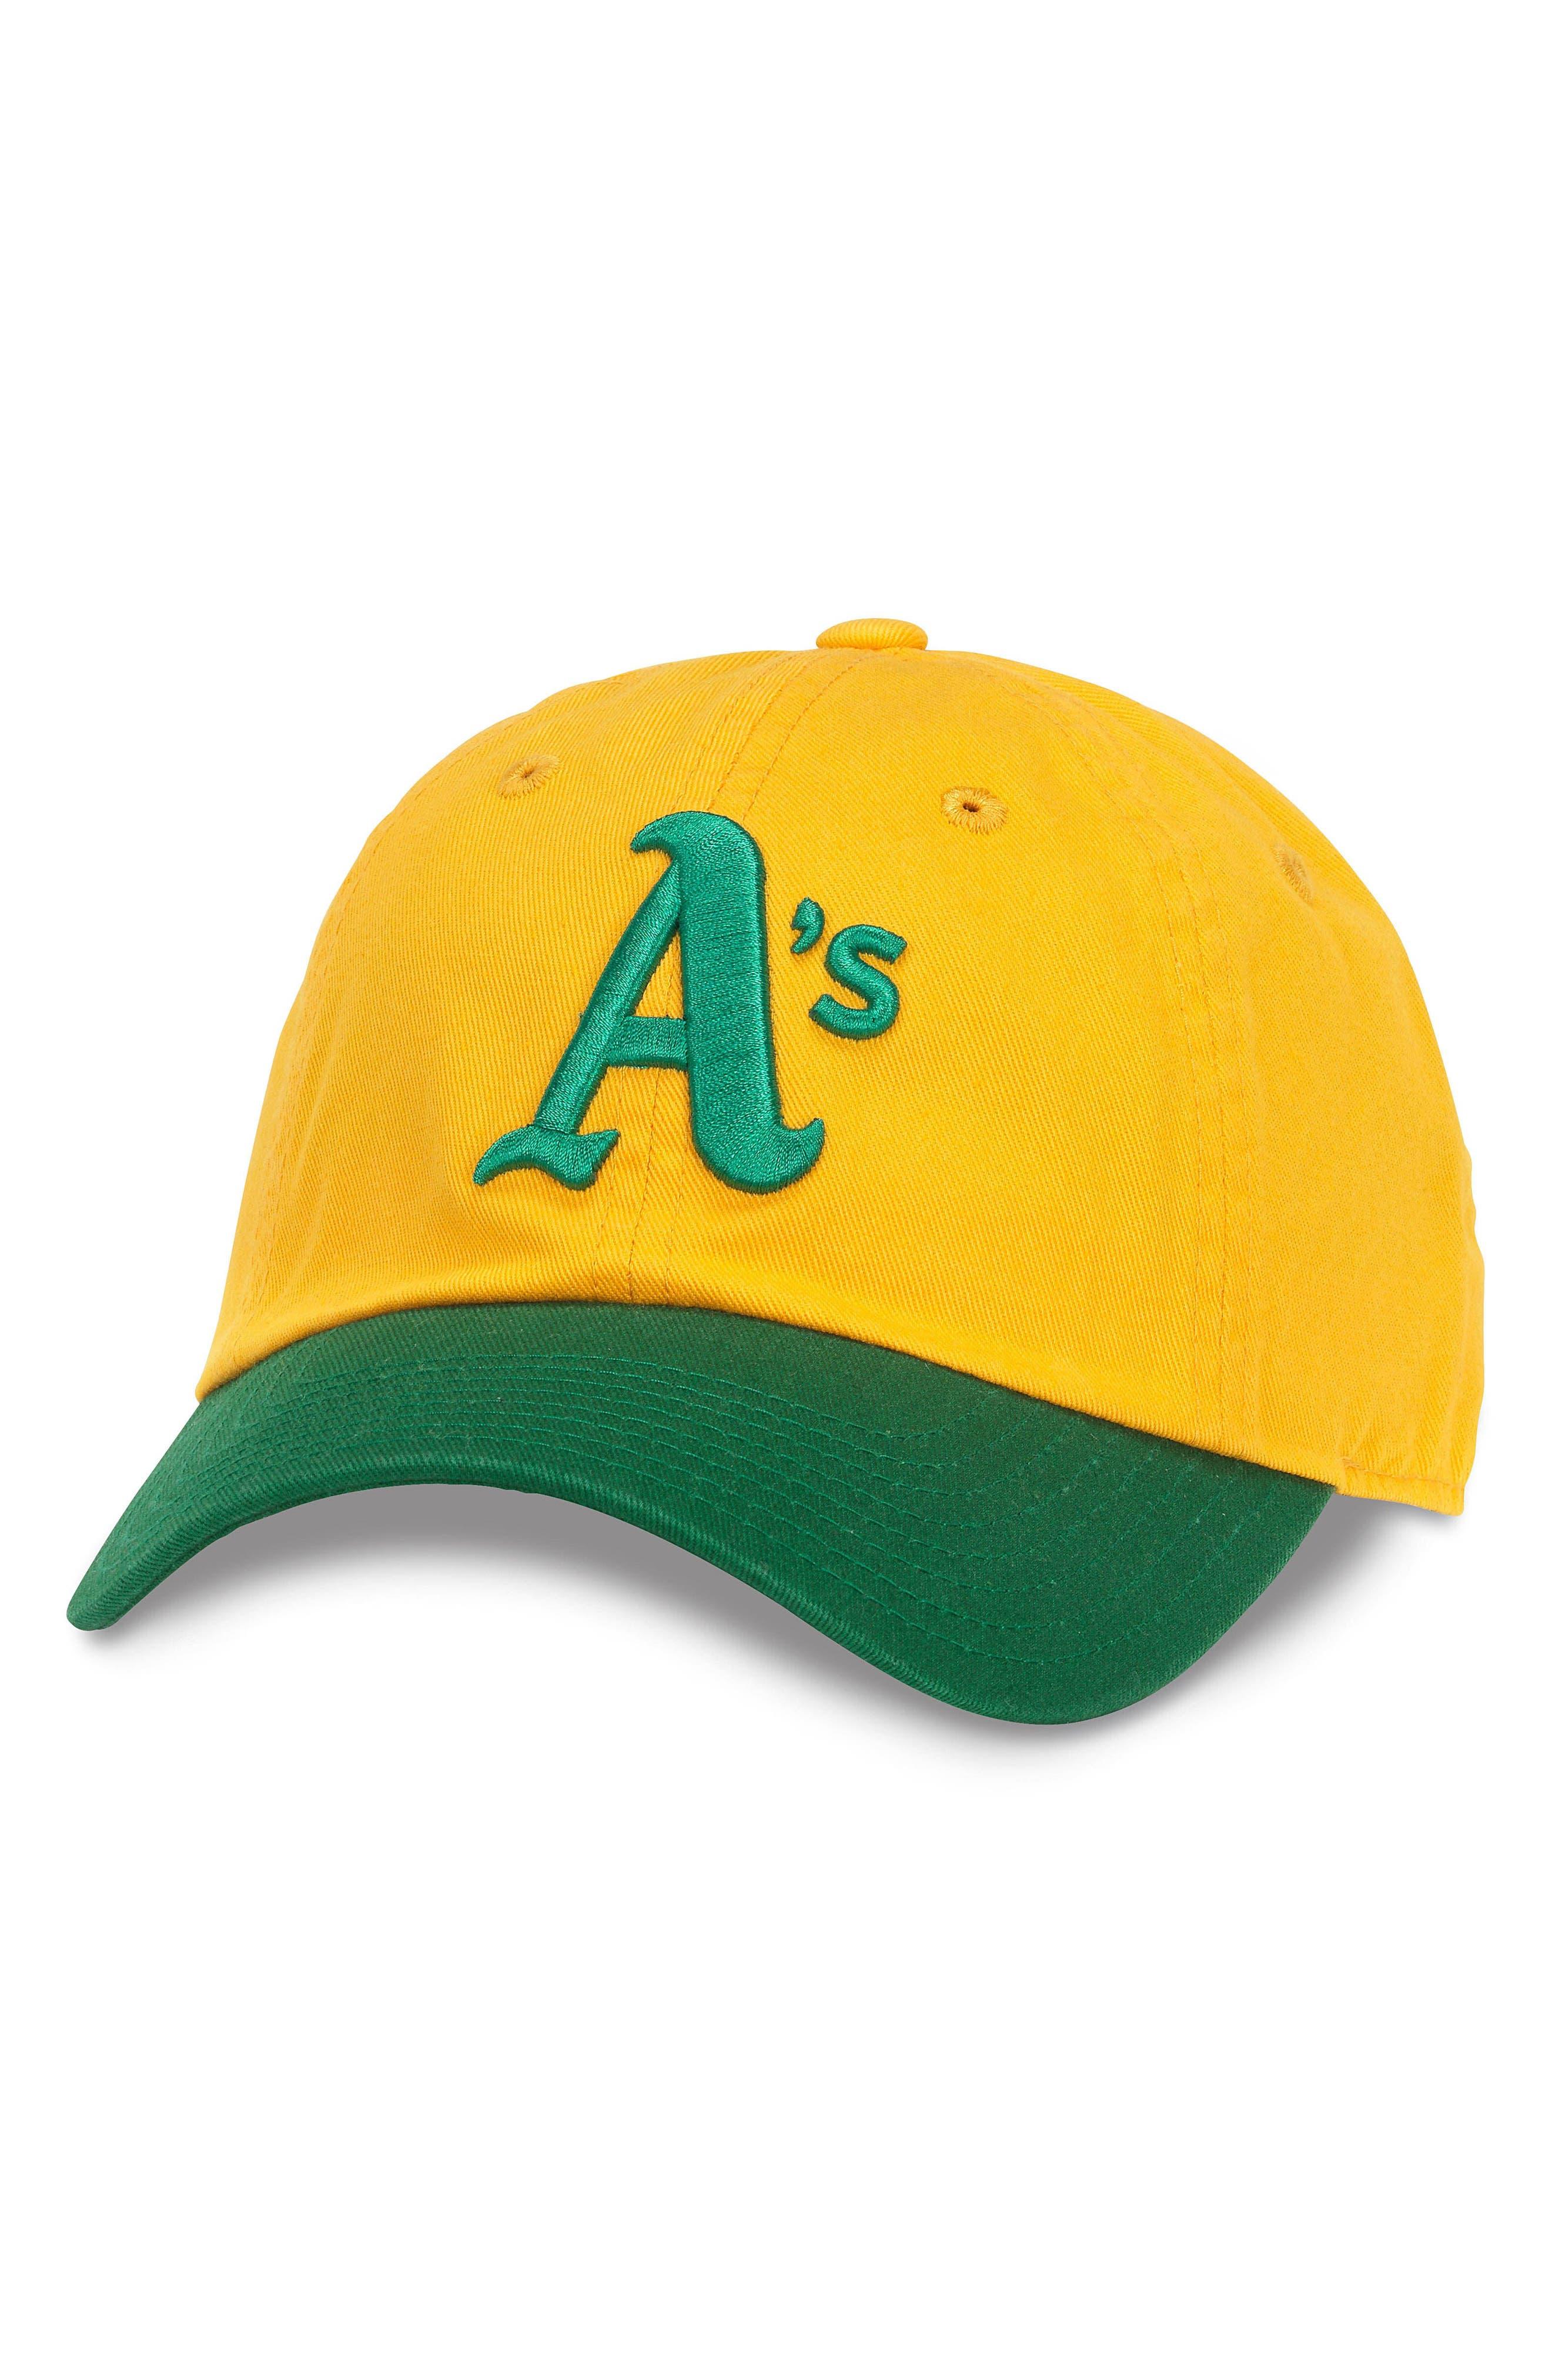 American Needle Ballpark MLB Baseball Cap